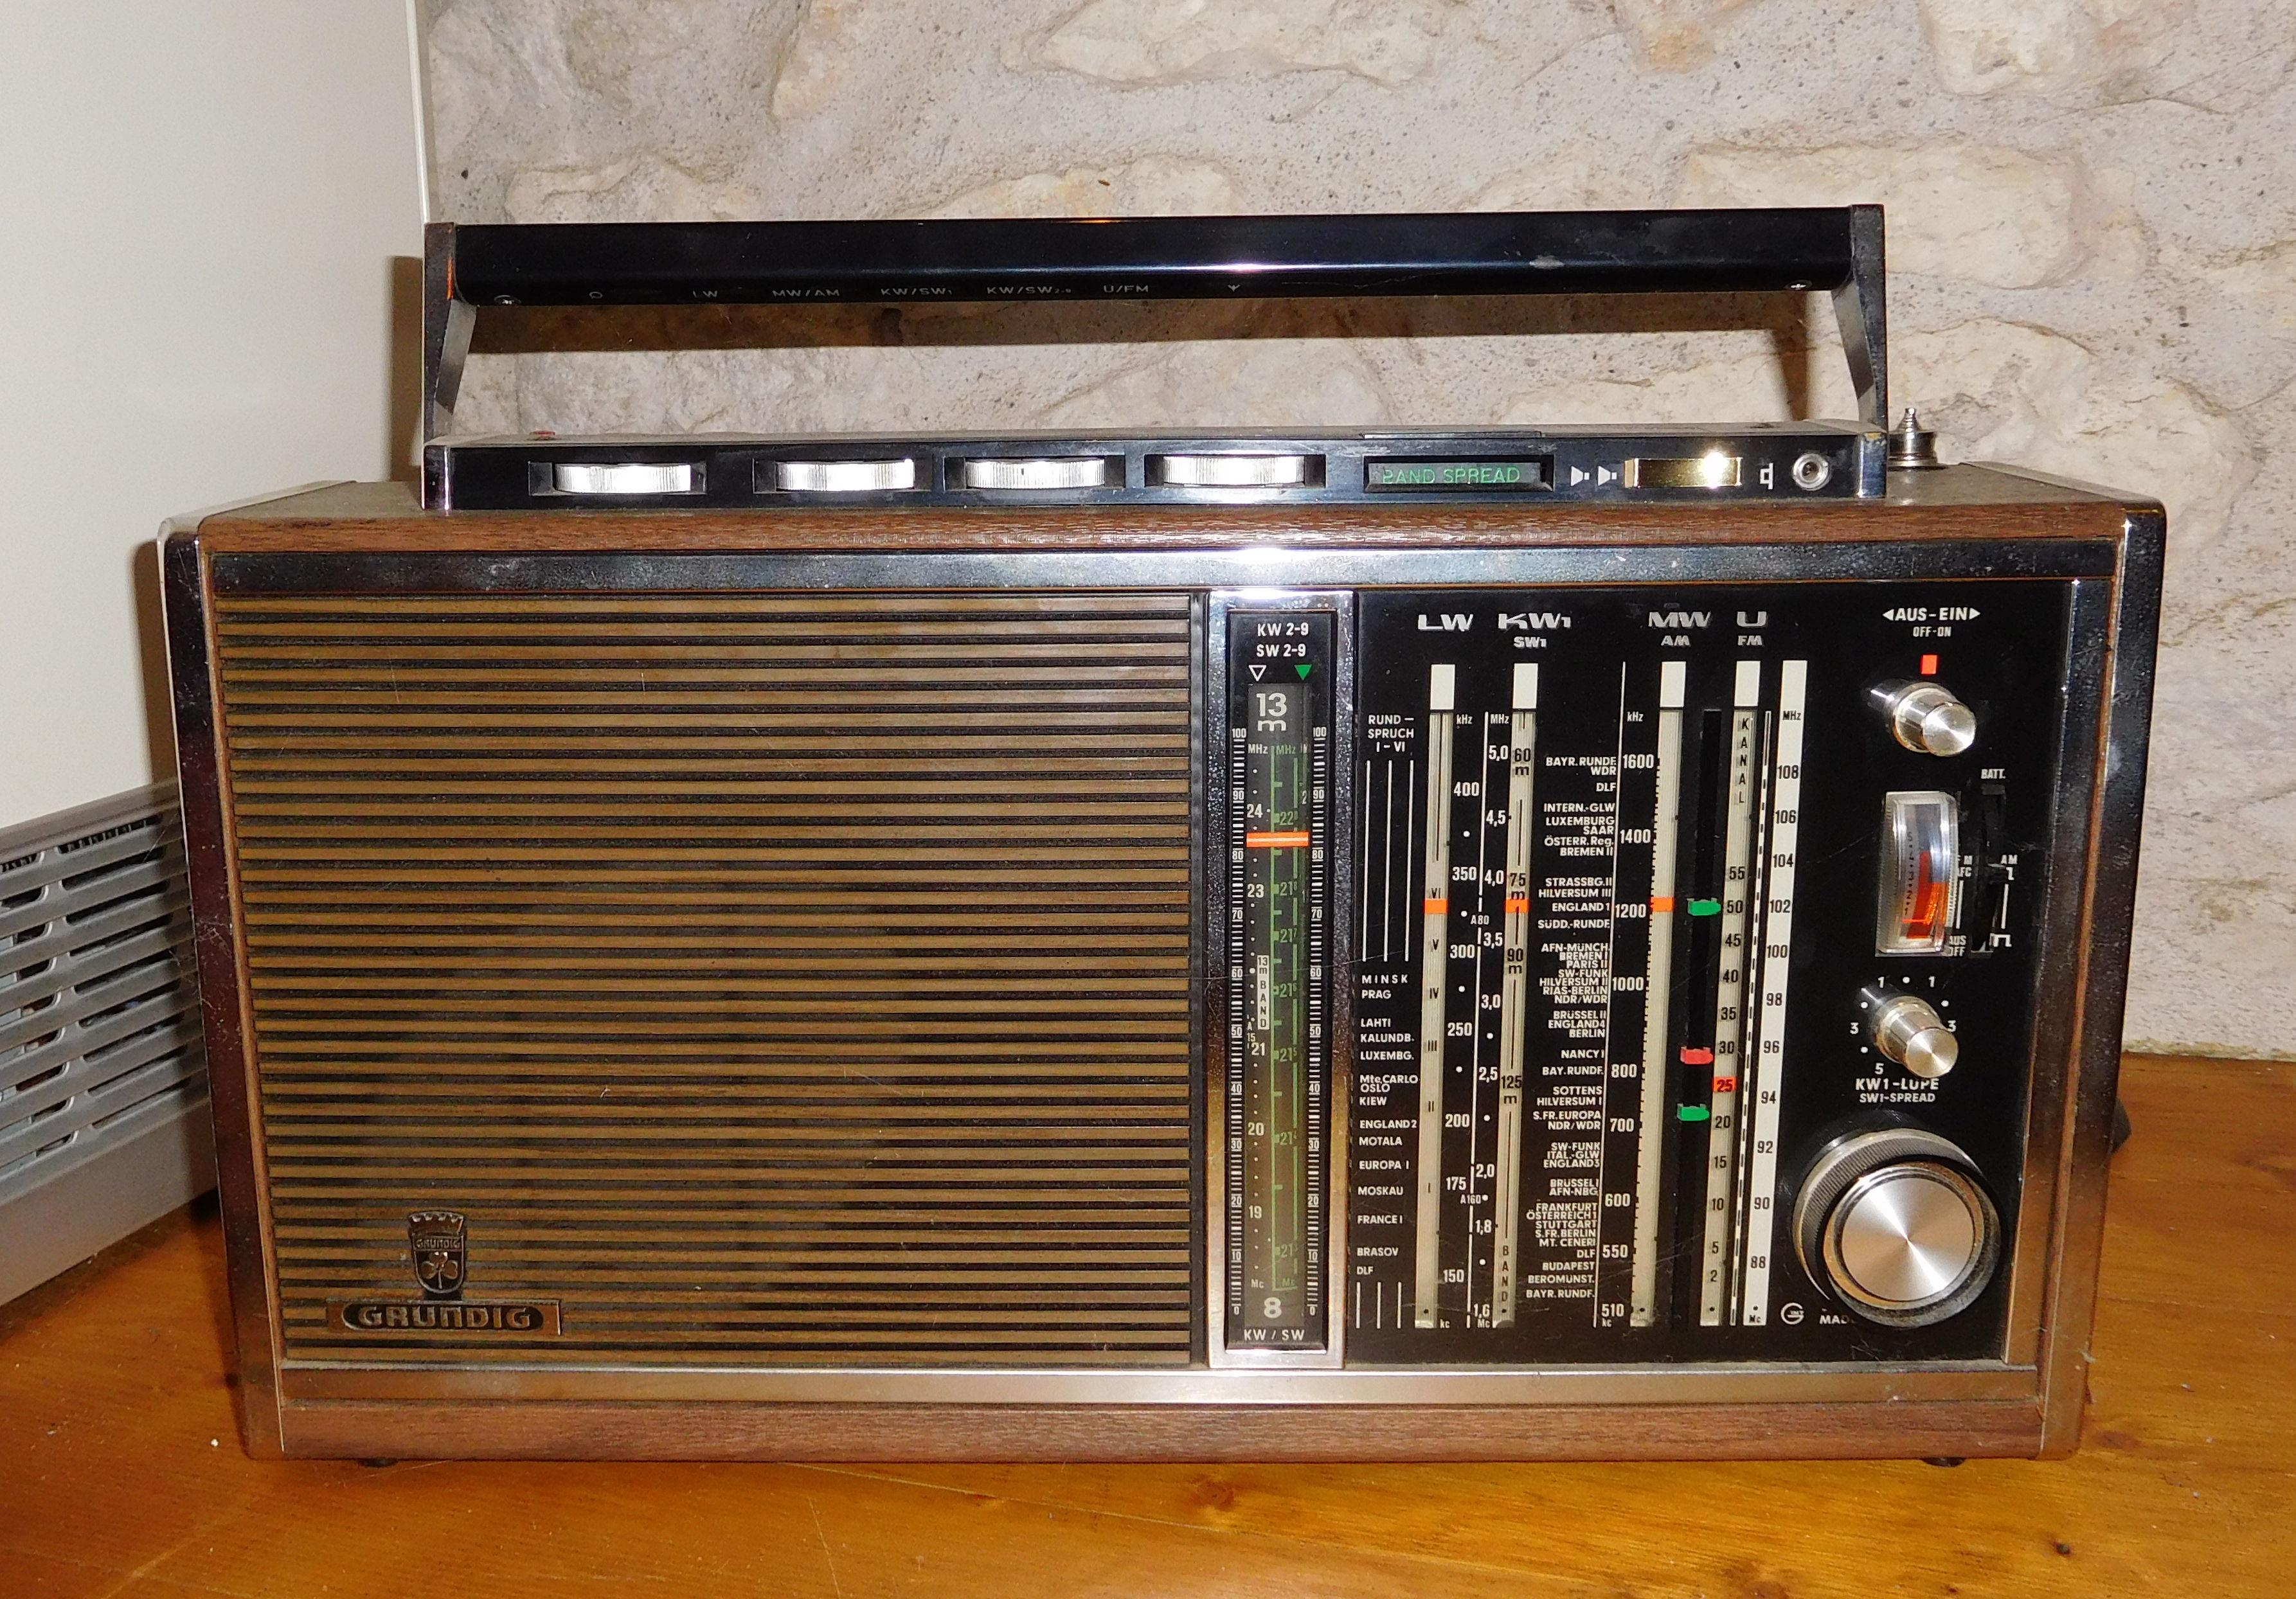 Shortwave radio receiver - Wikipedia